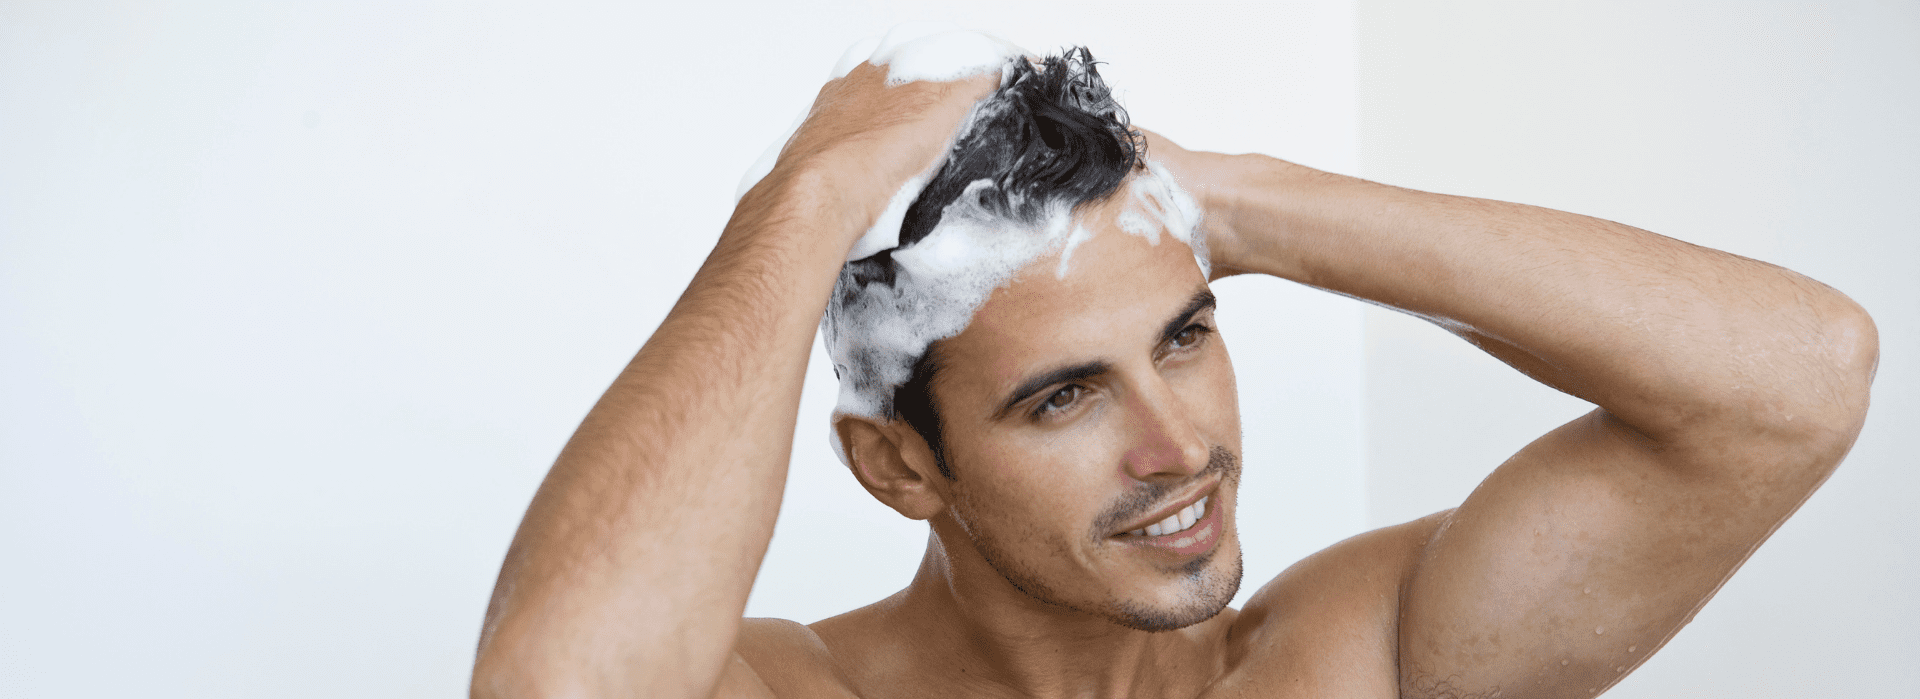 shampoo and washing a hair post hair transplant treatment